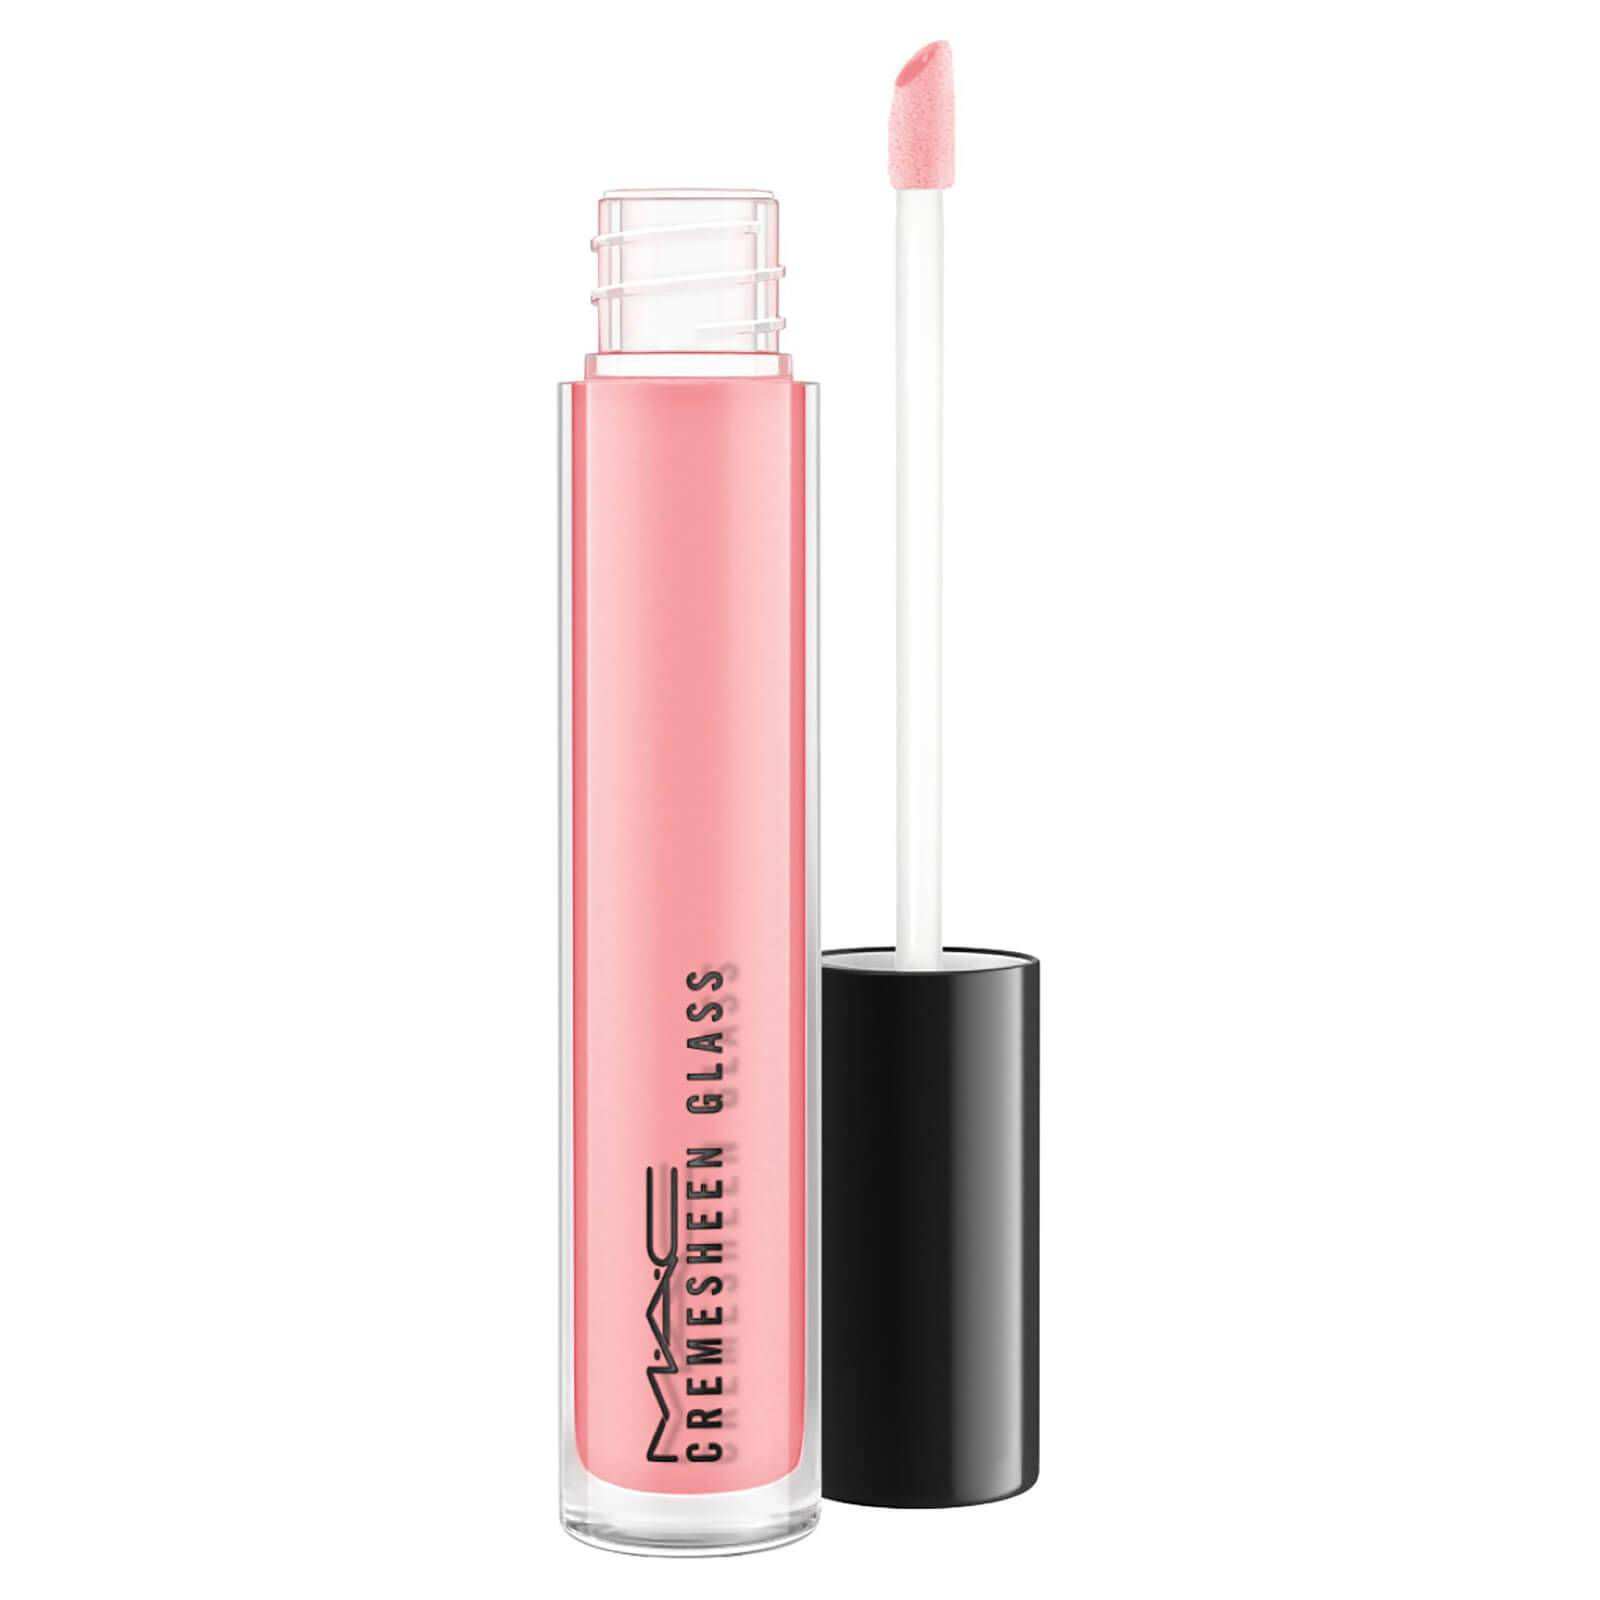 MAC Brillant à Lèvres Cremesheen Glass Lip Finish (teintes variées) - Just Superb